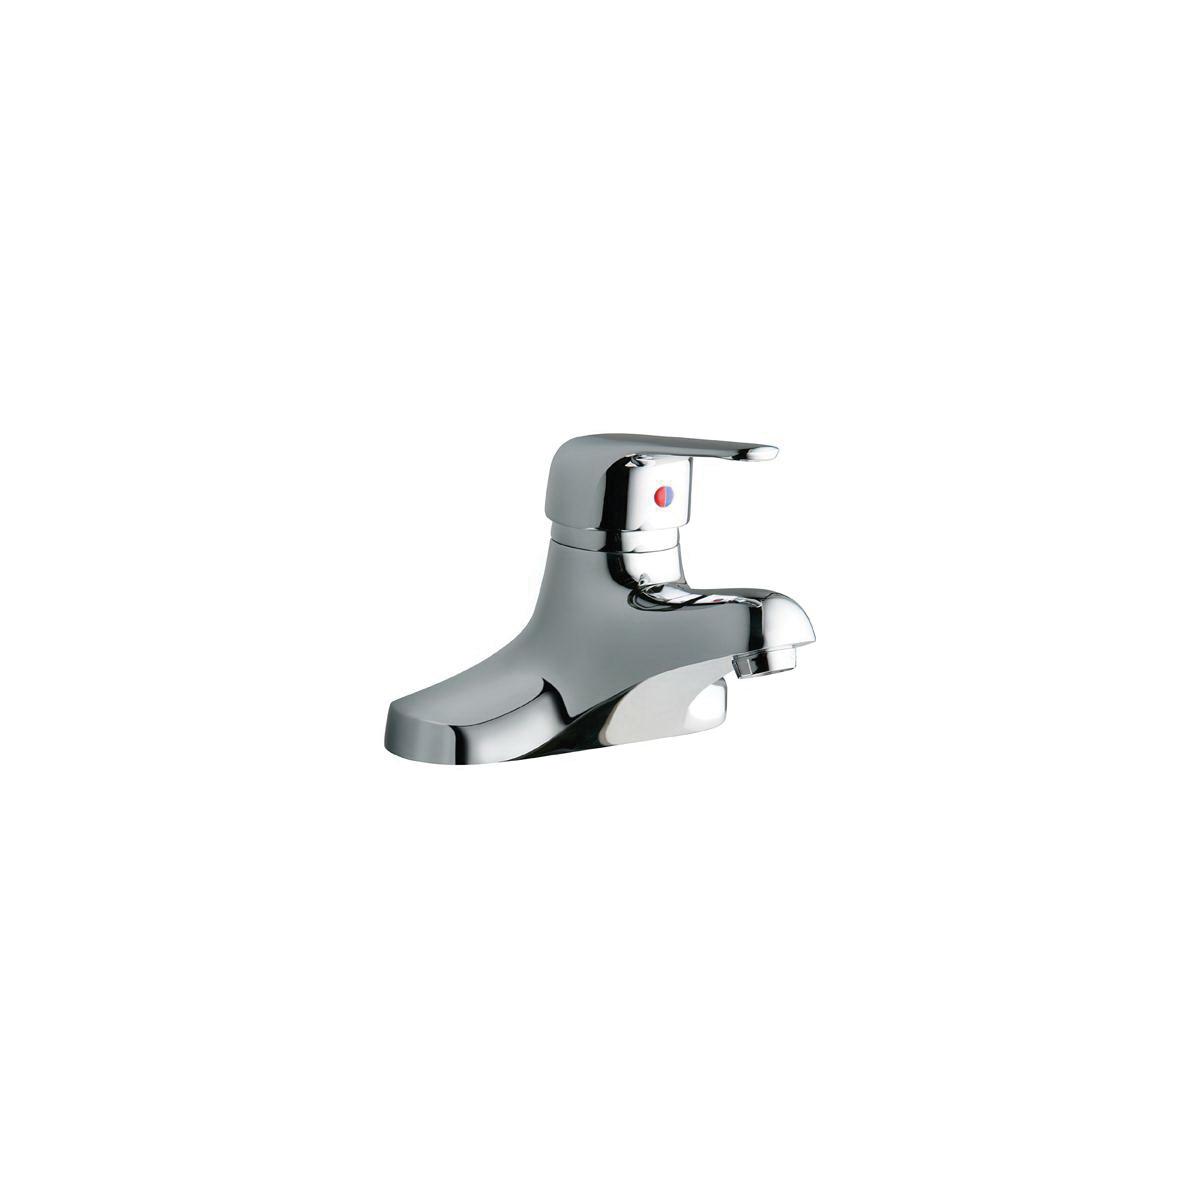 Elkay® LK422L4 Centerset Lavatory Faucet, Chrome Plated, 1 Handles, 0.5 gpm